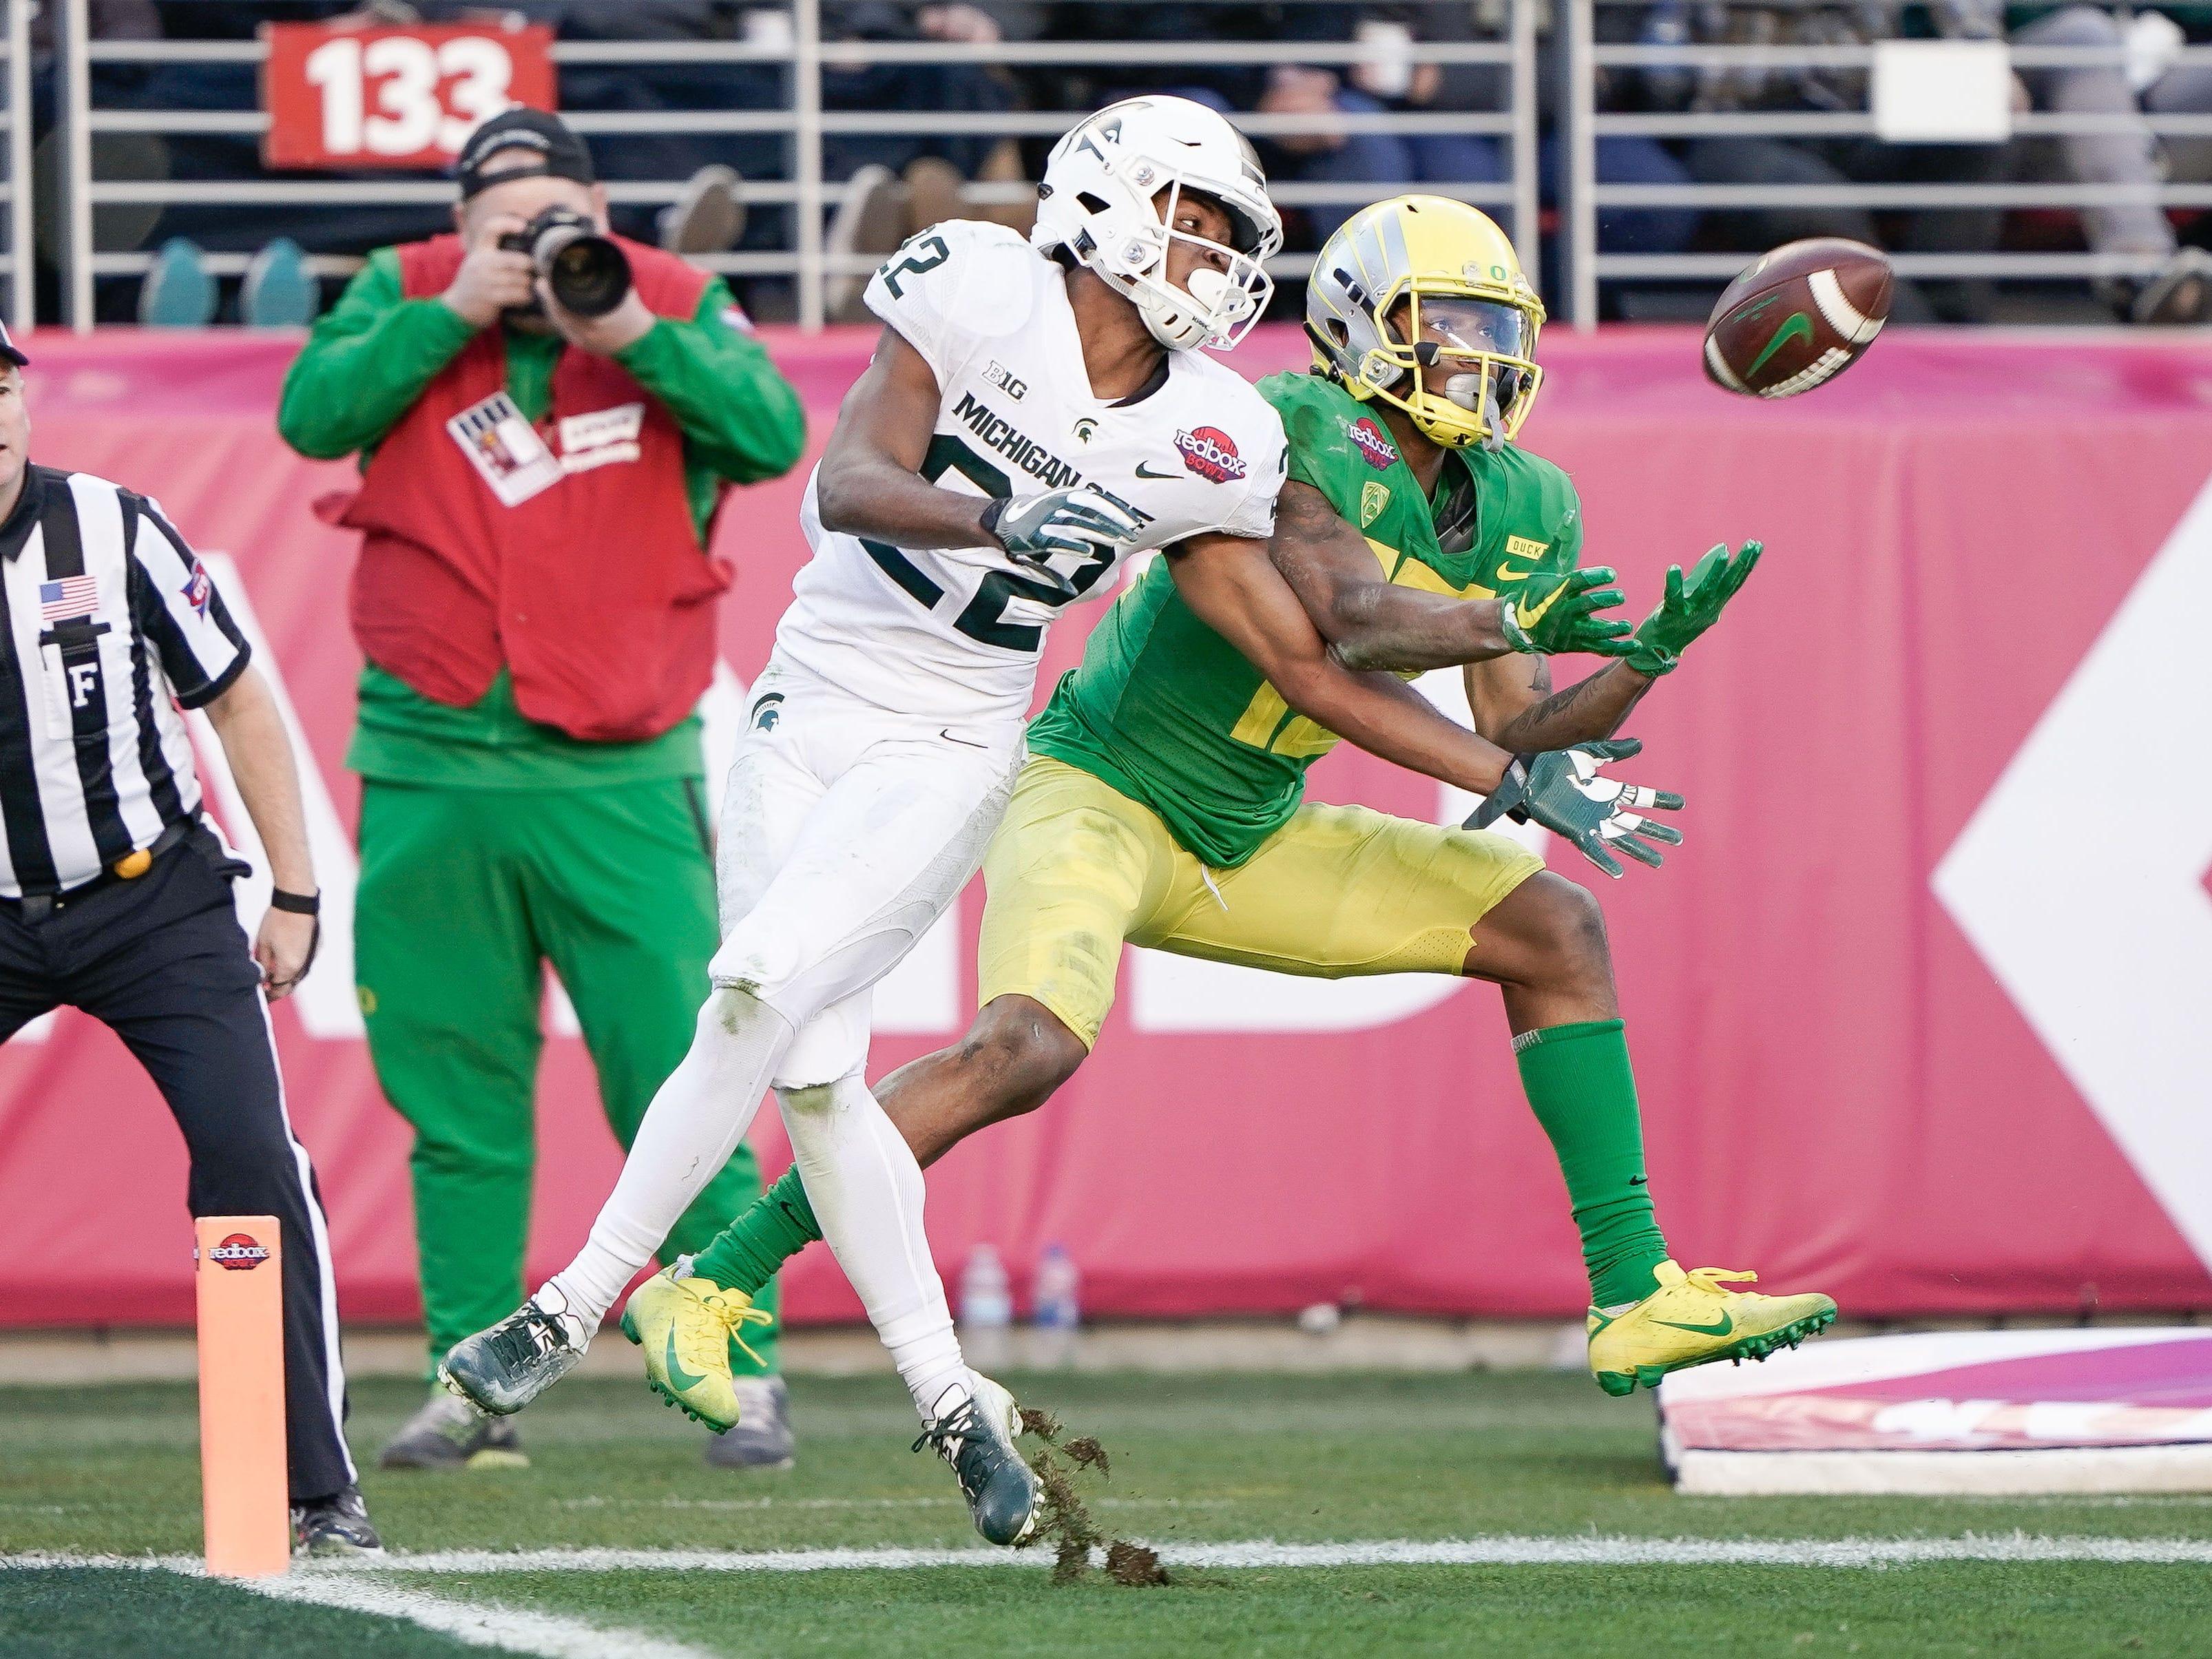 Michigan State Spartans cornerback Josiah Scott (22) battles Oregon Ducks wide receiver Dillon Mitchell (13) for a pass during the fourth quarter at Levi's Stadium.